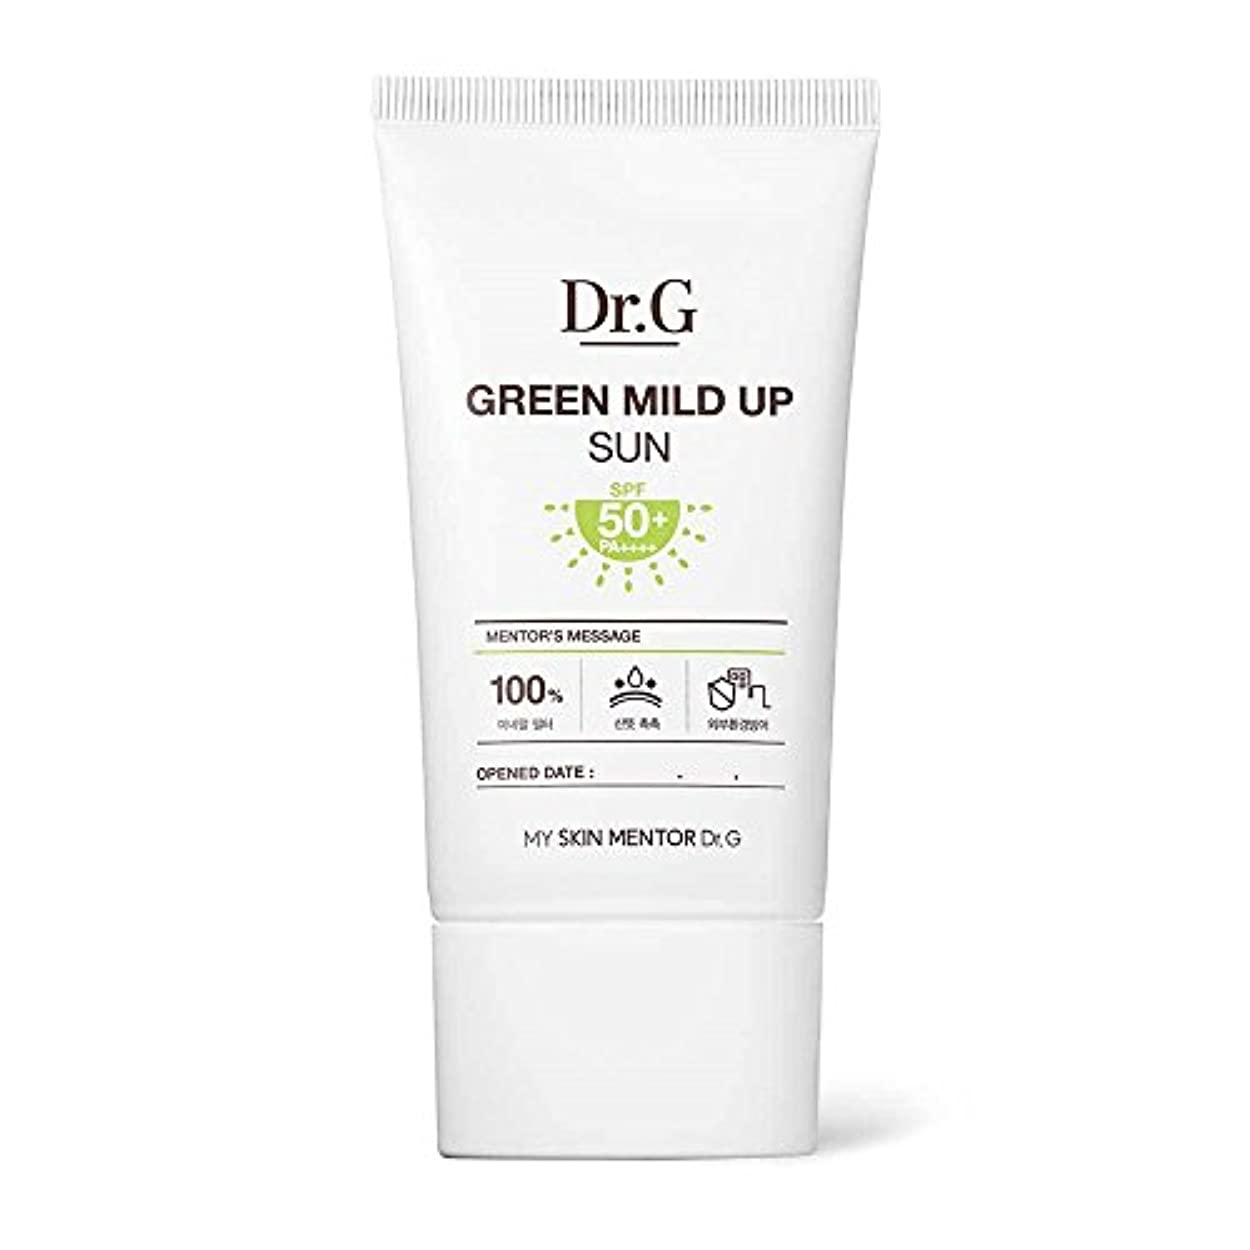 Dr.G Green Mild Up Sun SPF50+/PA++++ 50ml ドクタージー グリーン マイルド アップ サン 日焼け止め